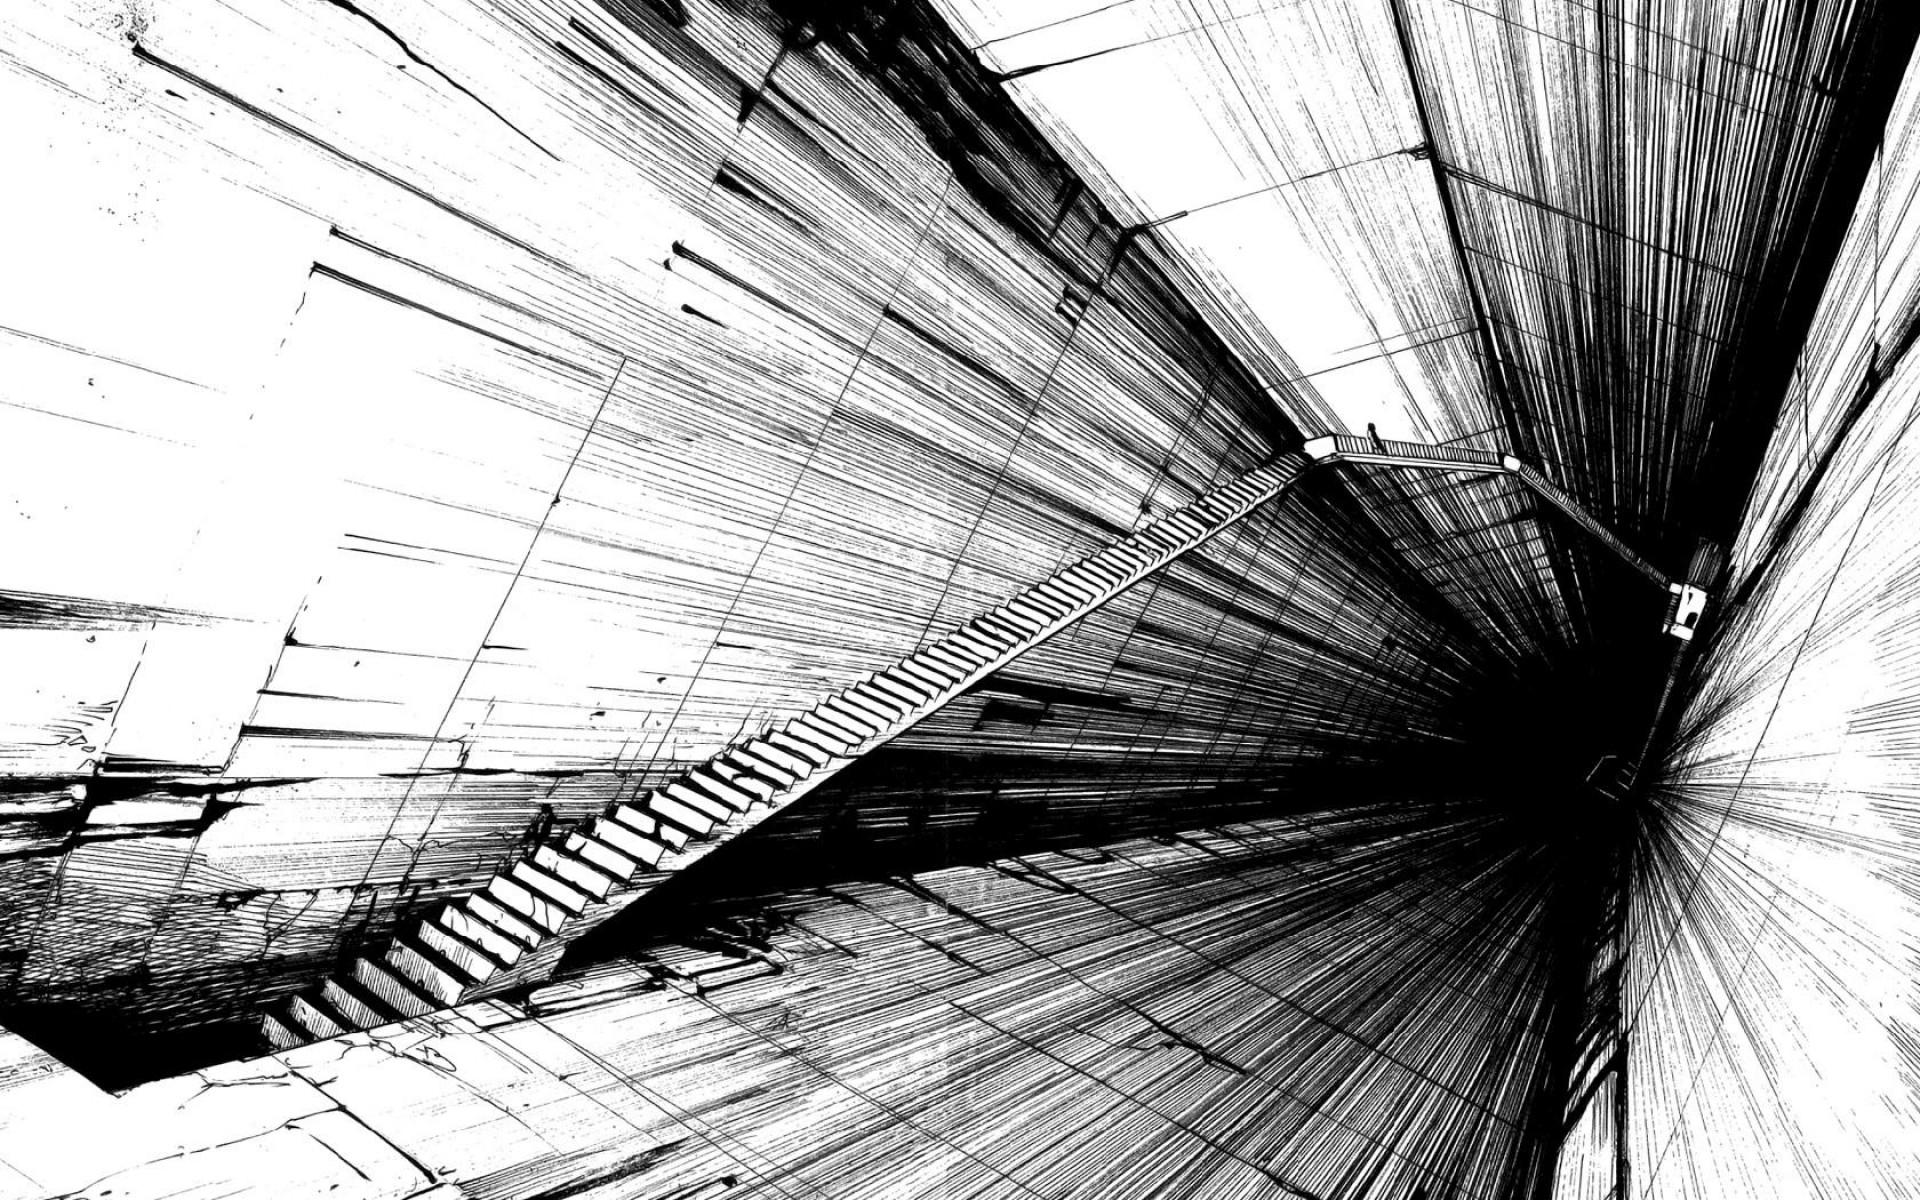 Dark Abstract Clipart 1920x1080.